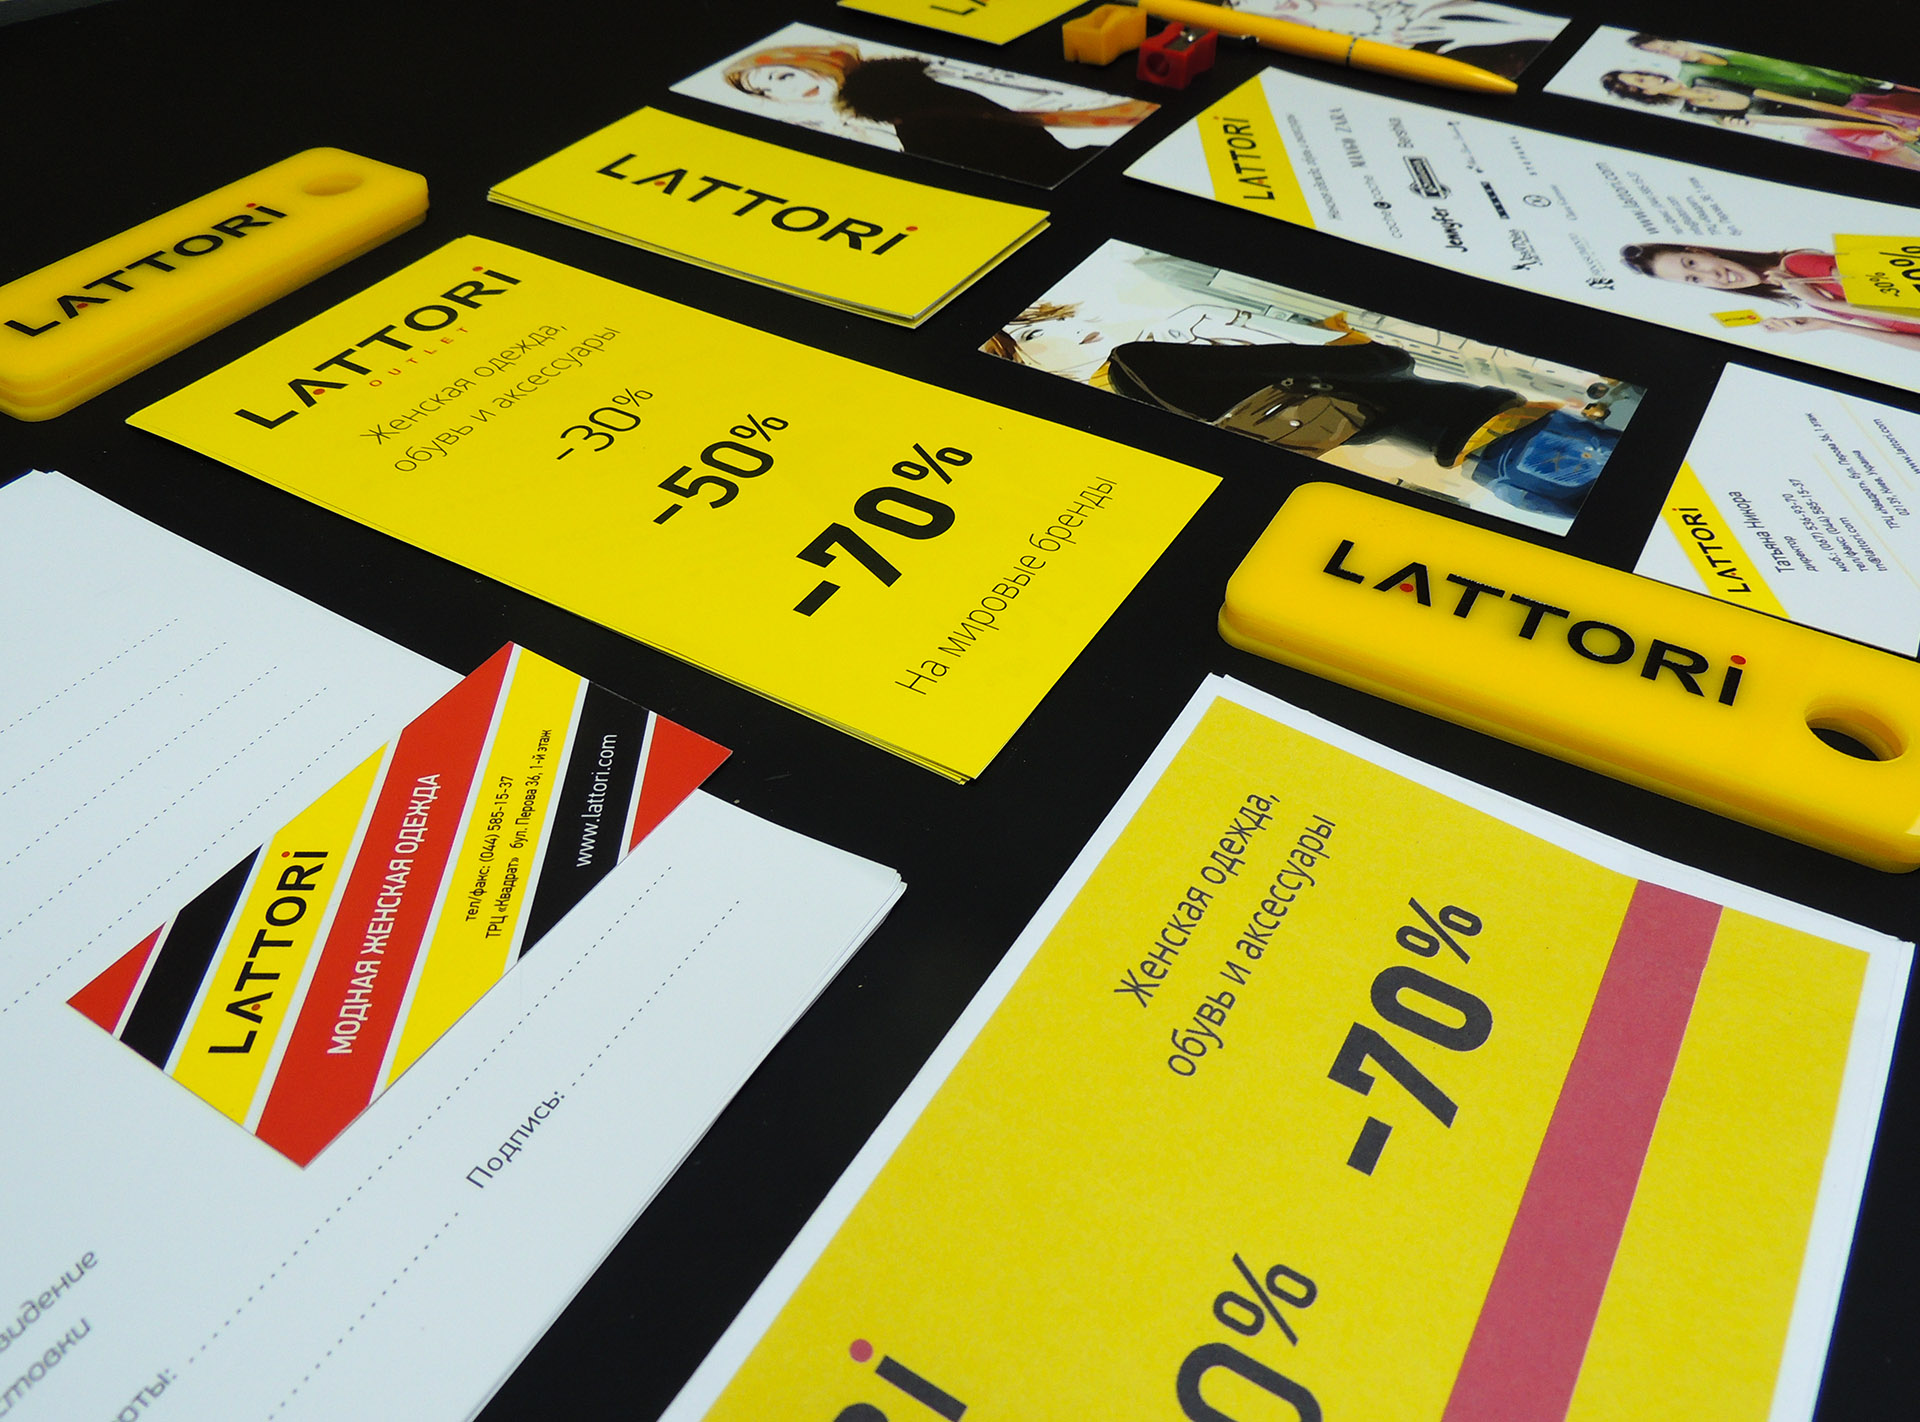 corporate identity магазина clothes элементы of the corporate identity, визитки, листовка, номерки